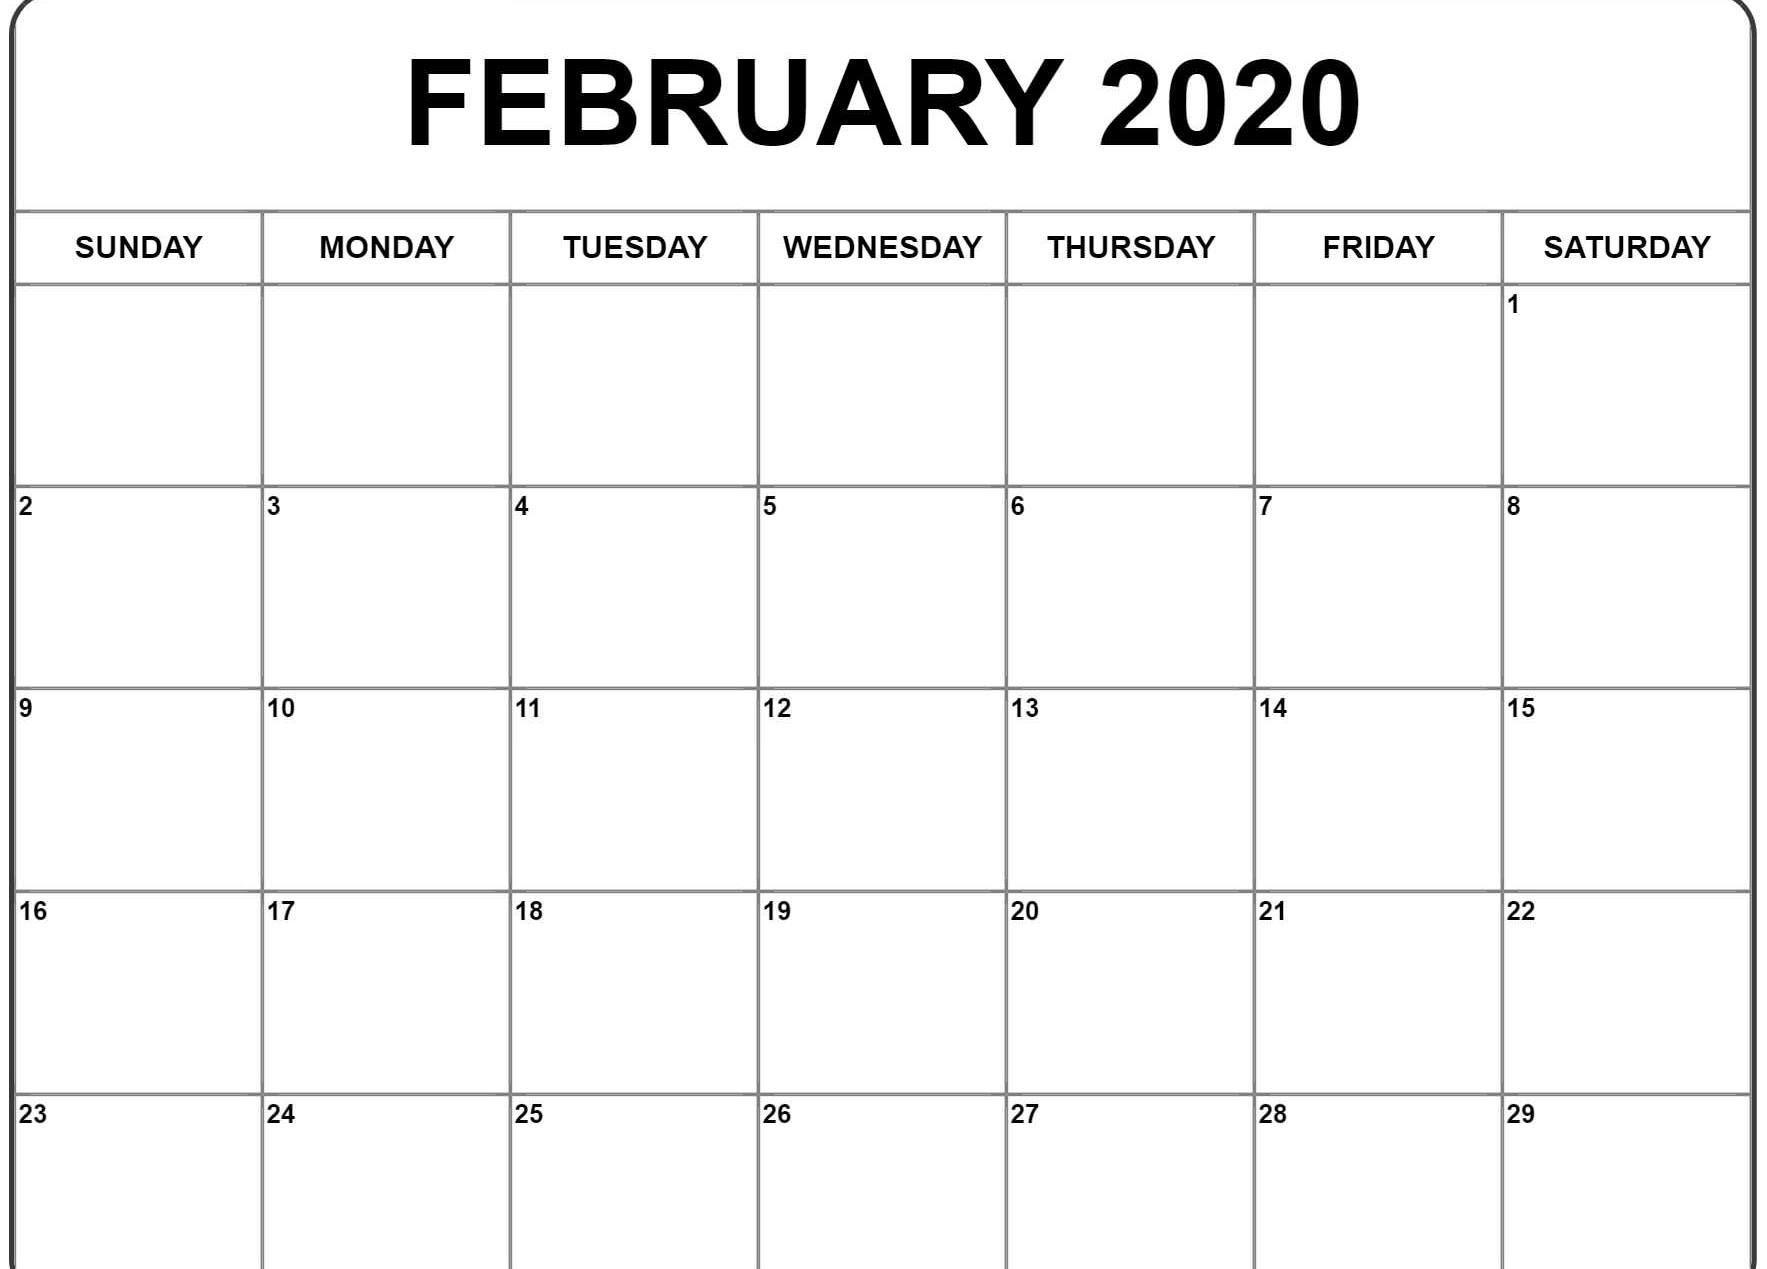 Free 2020 Editable February Calendar Blank Template  Free Editable 2020 Monthly Calendars With Notes